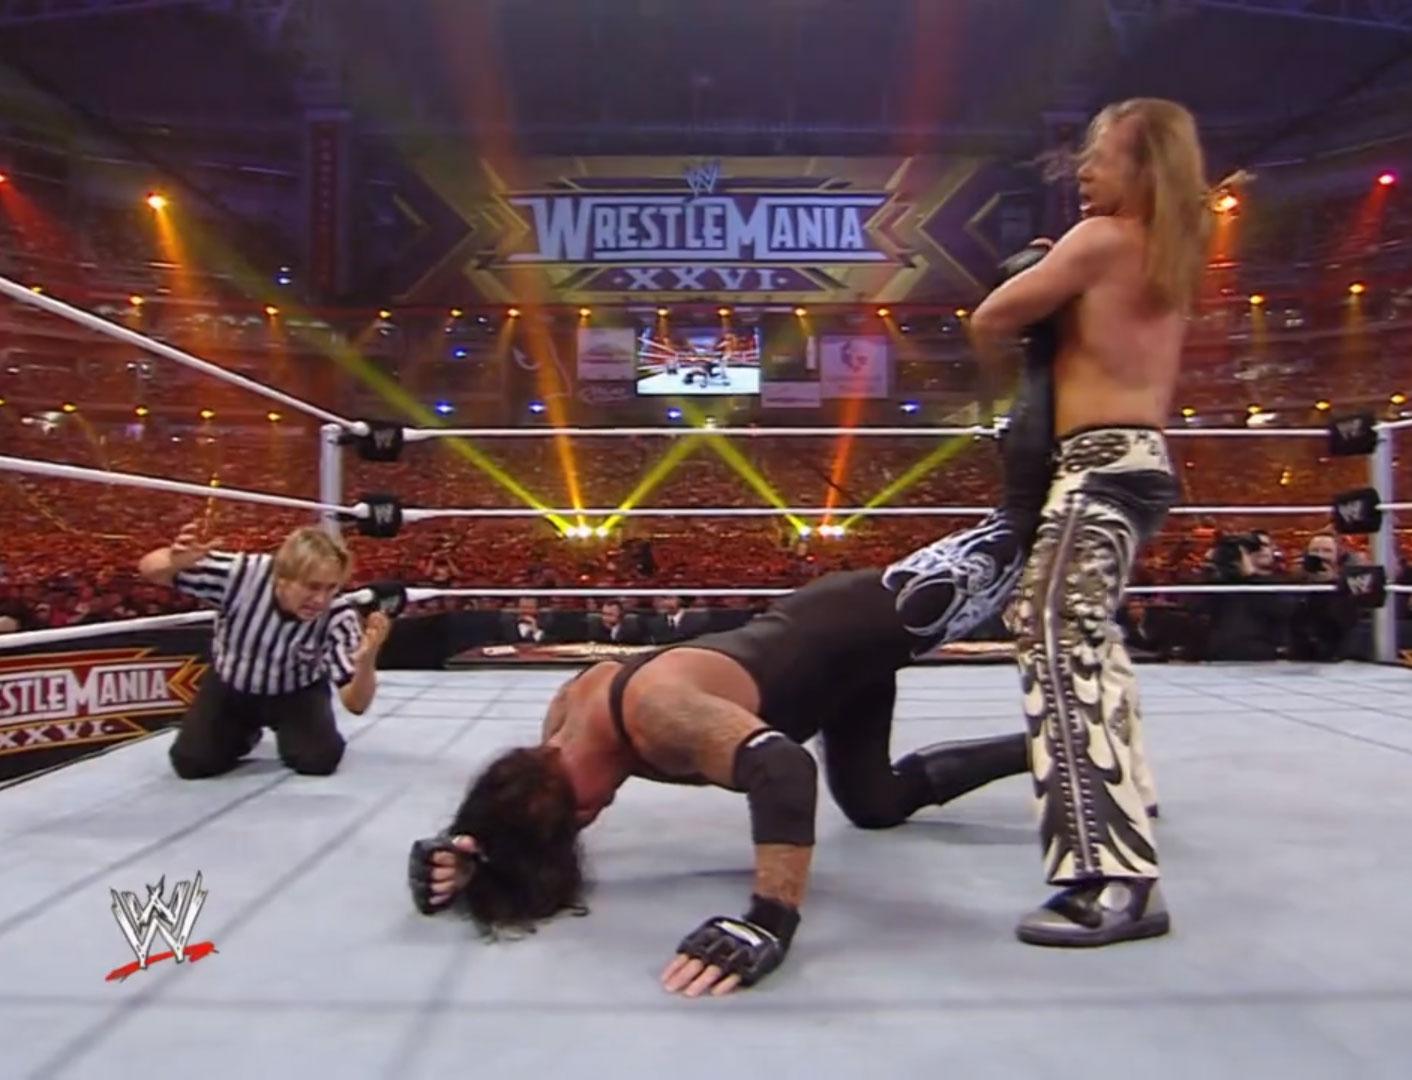 Undertaker vs. Shawn Michaels Career vs. The Streak Match WWE WrestleMania XXVI Mar 28th 2010